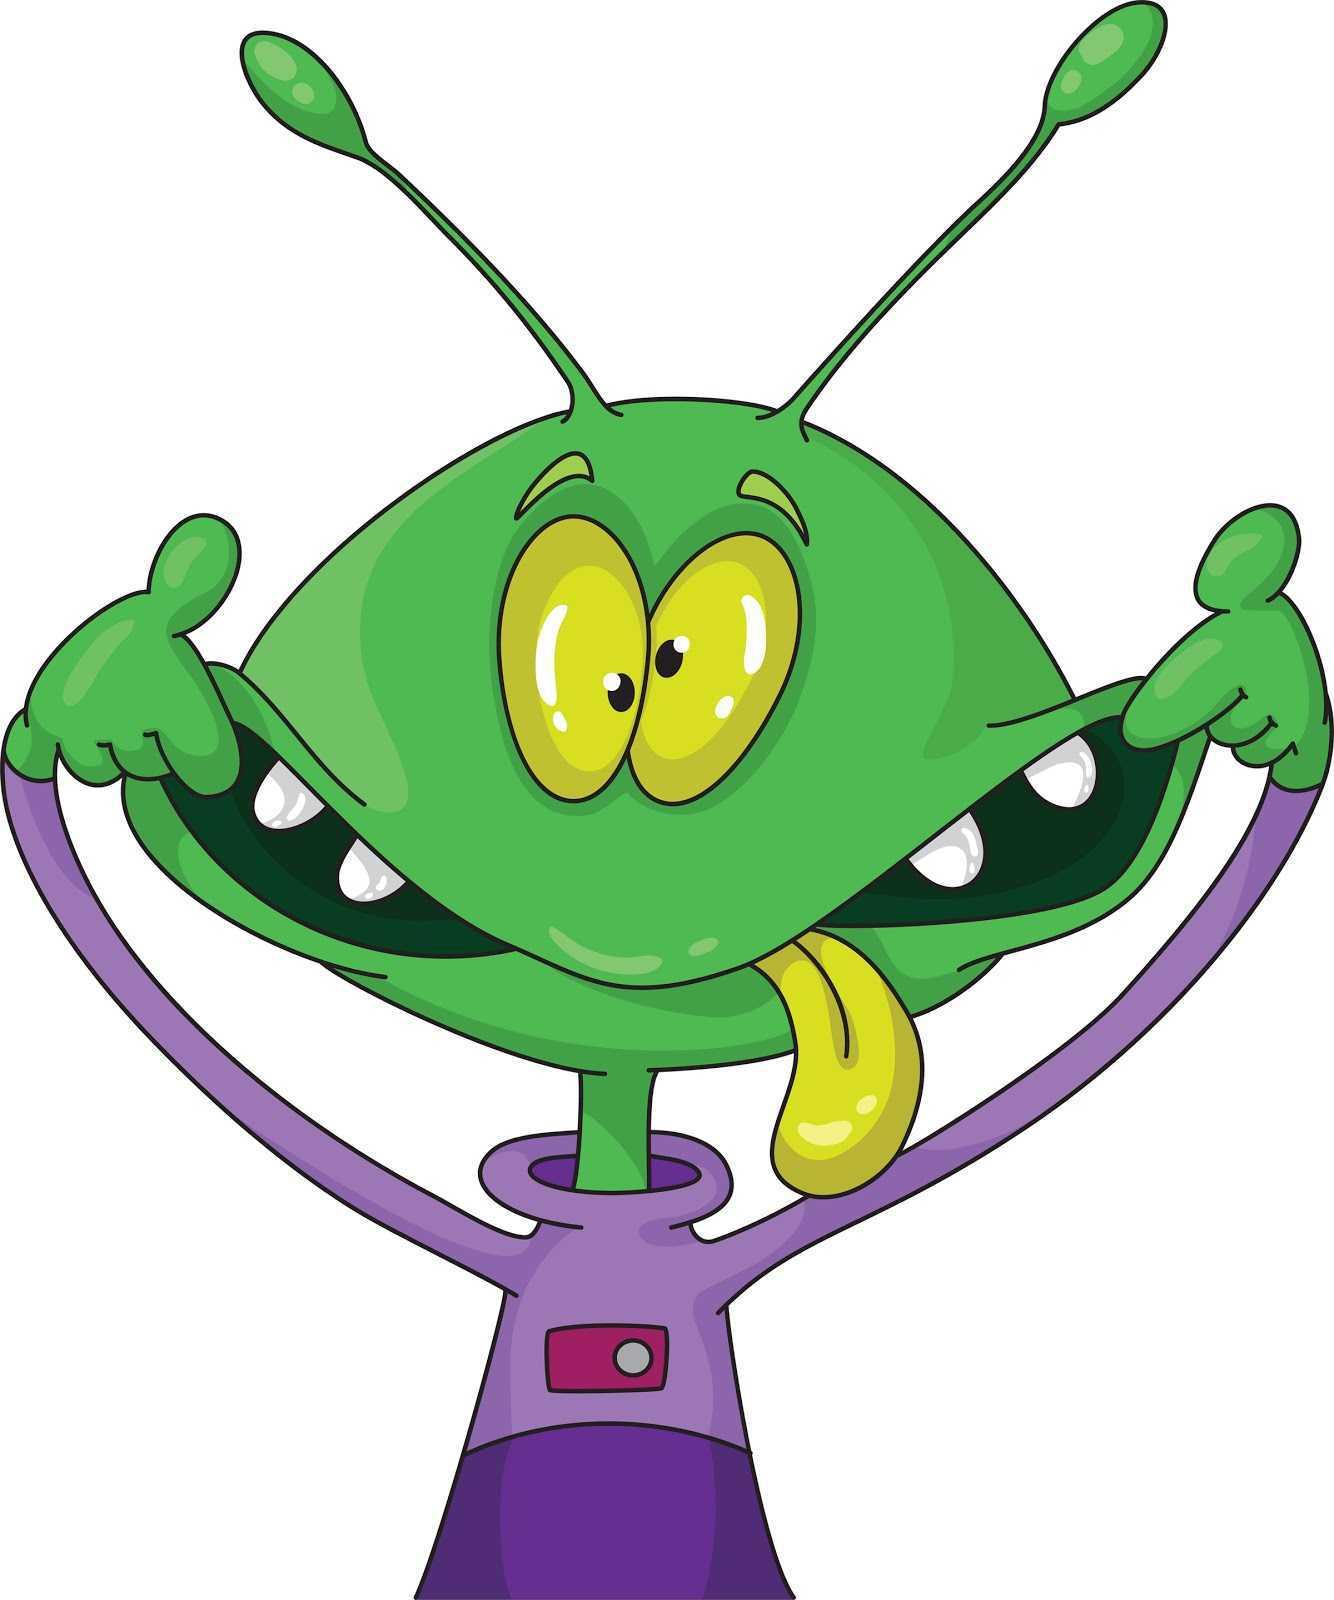 Alien clipart sick. Kids arts and crafts